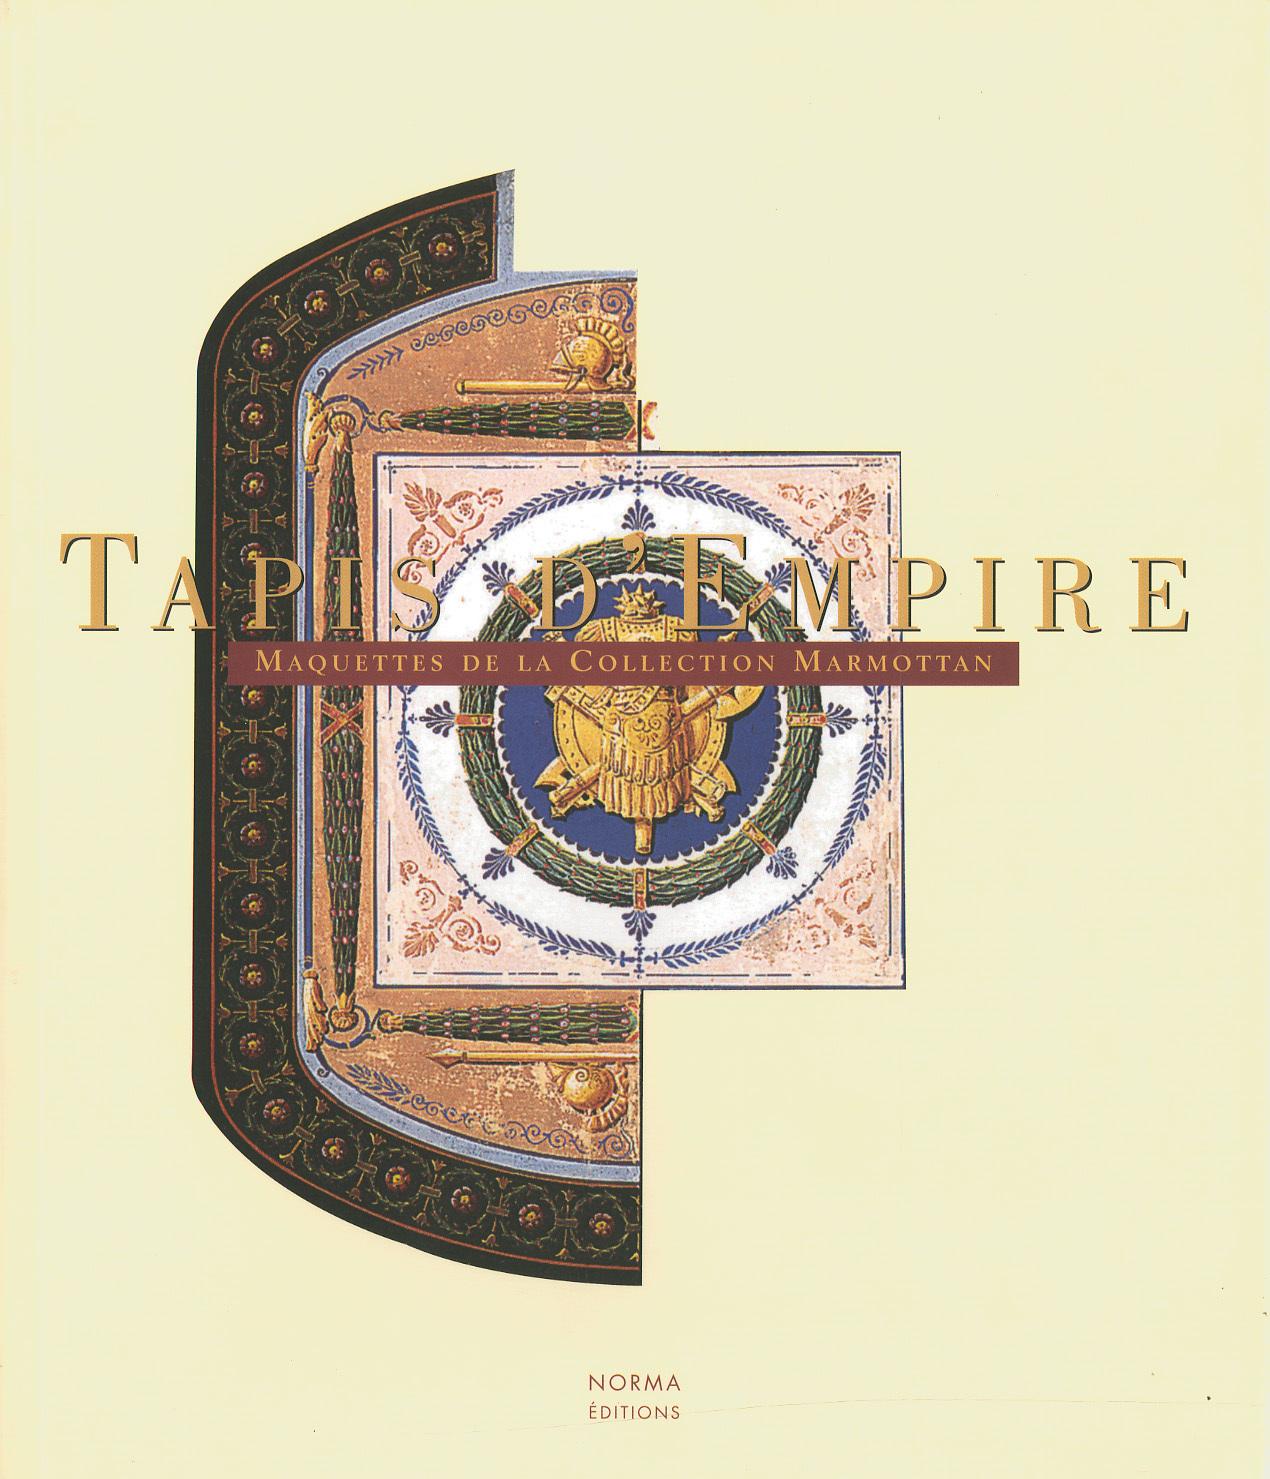 TAPIS D'EMPIRE